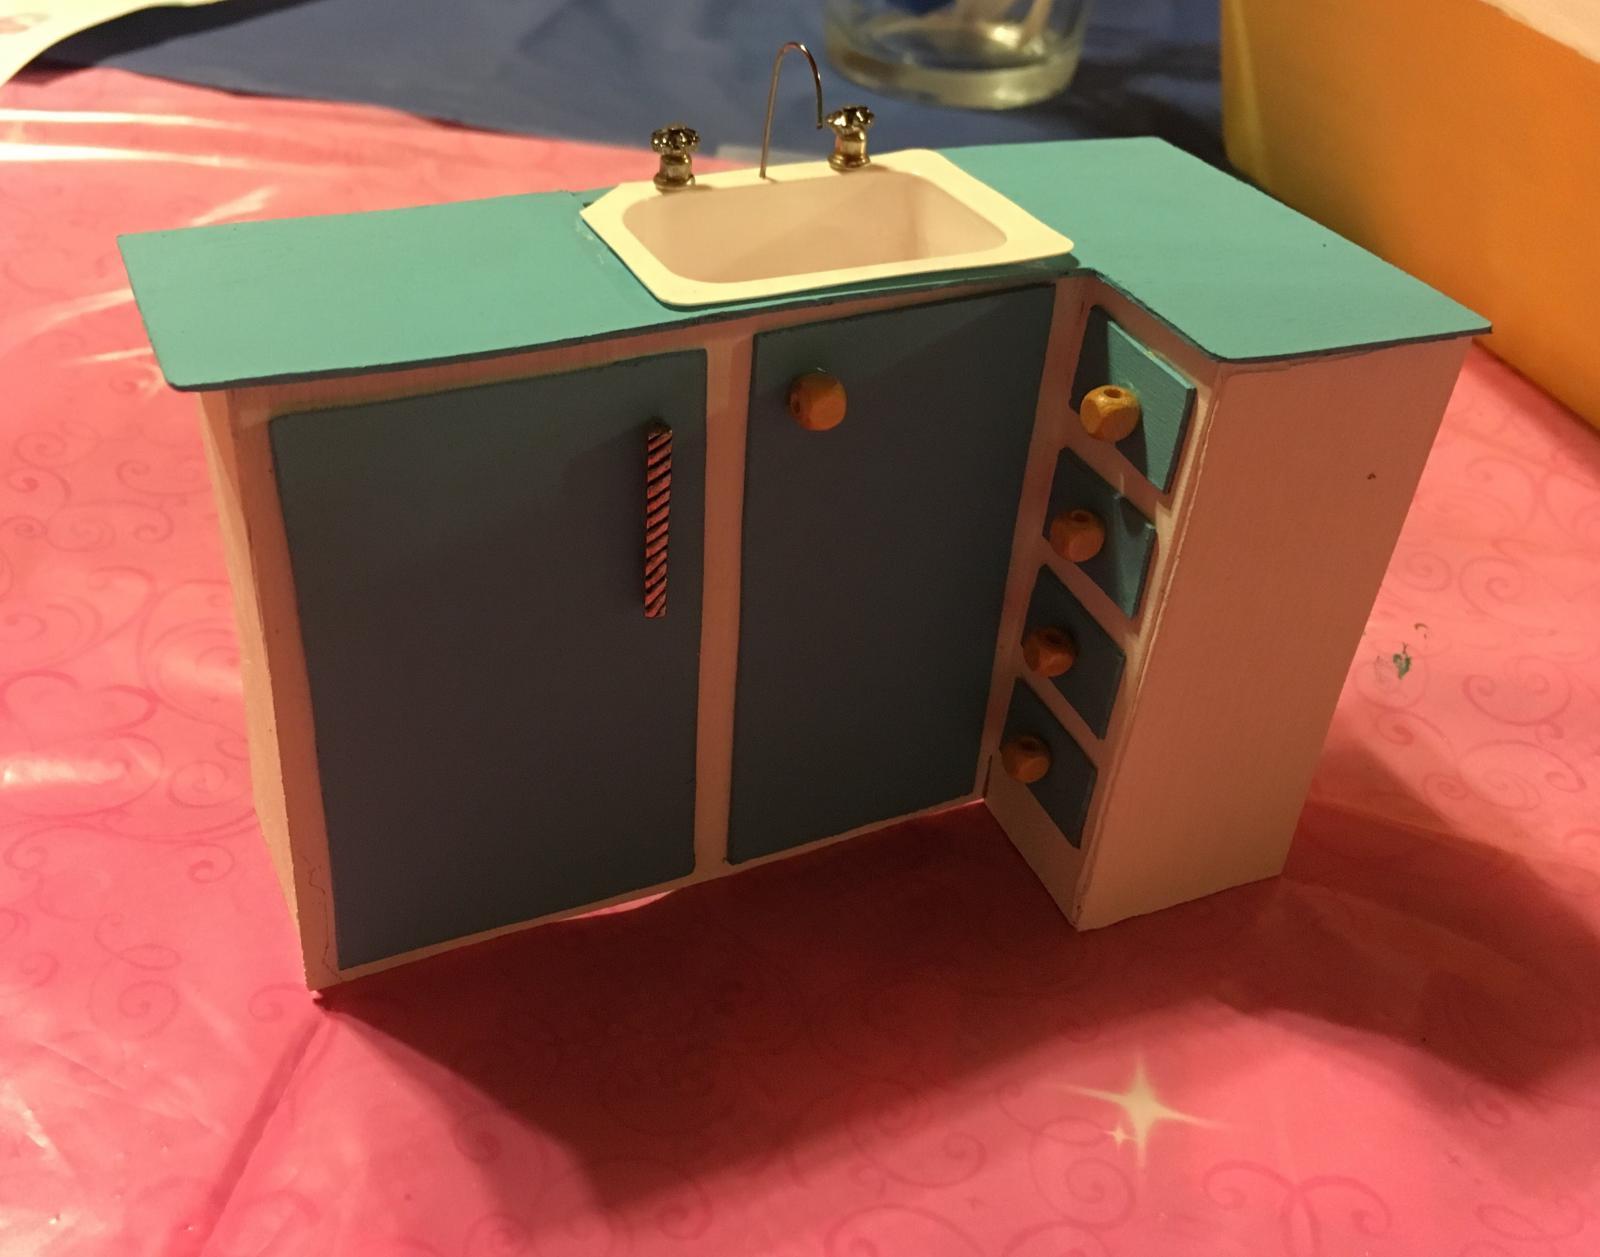 Trailer Kitchen Sink - Members\' Gallery - The Greenleaf Miniature ...